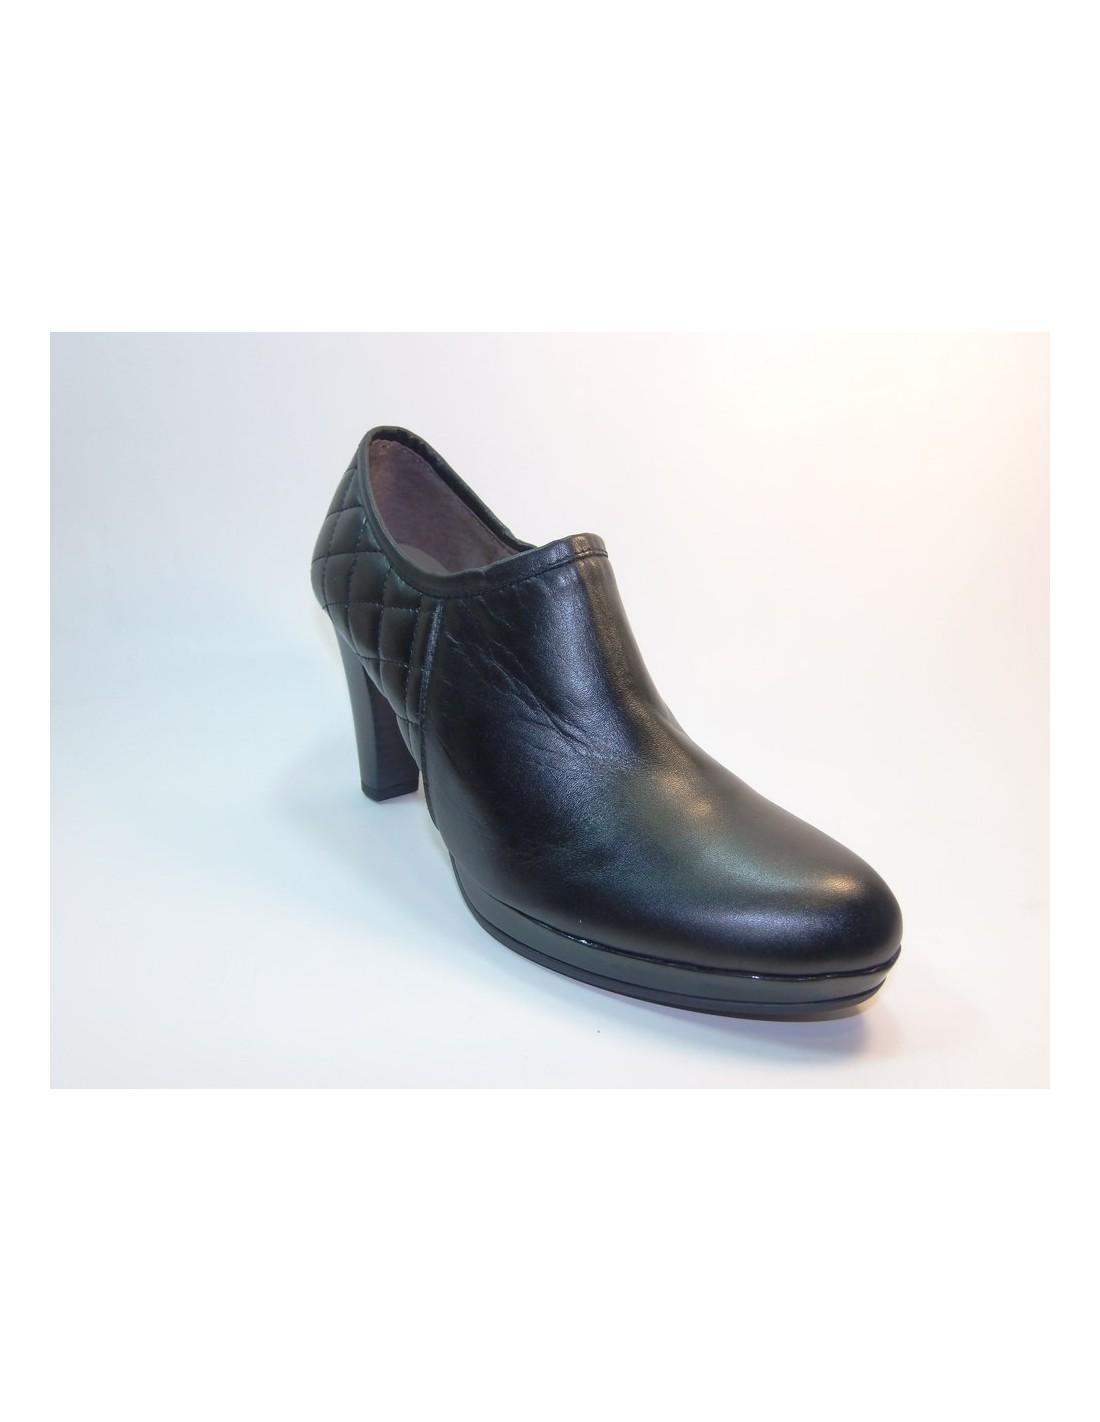 Marroqui Mujer Zapato Sanchez 8110 Botin Calzados Rivera kZiPuXO